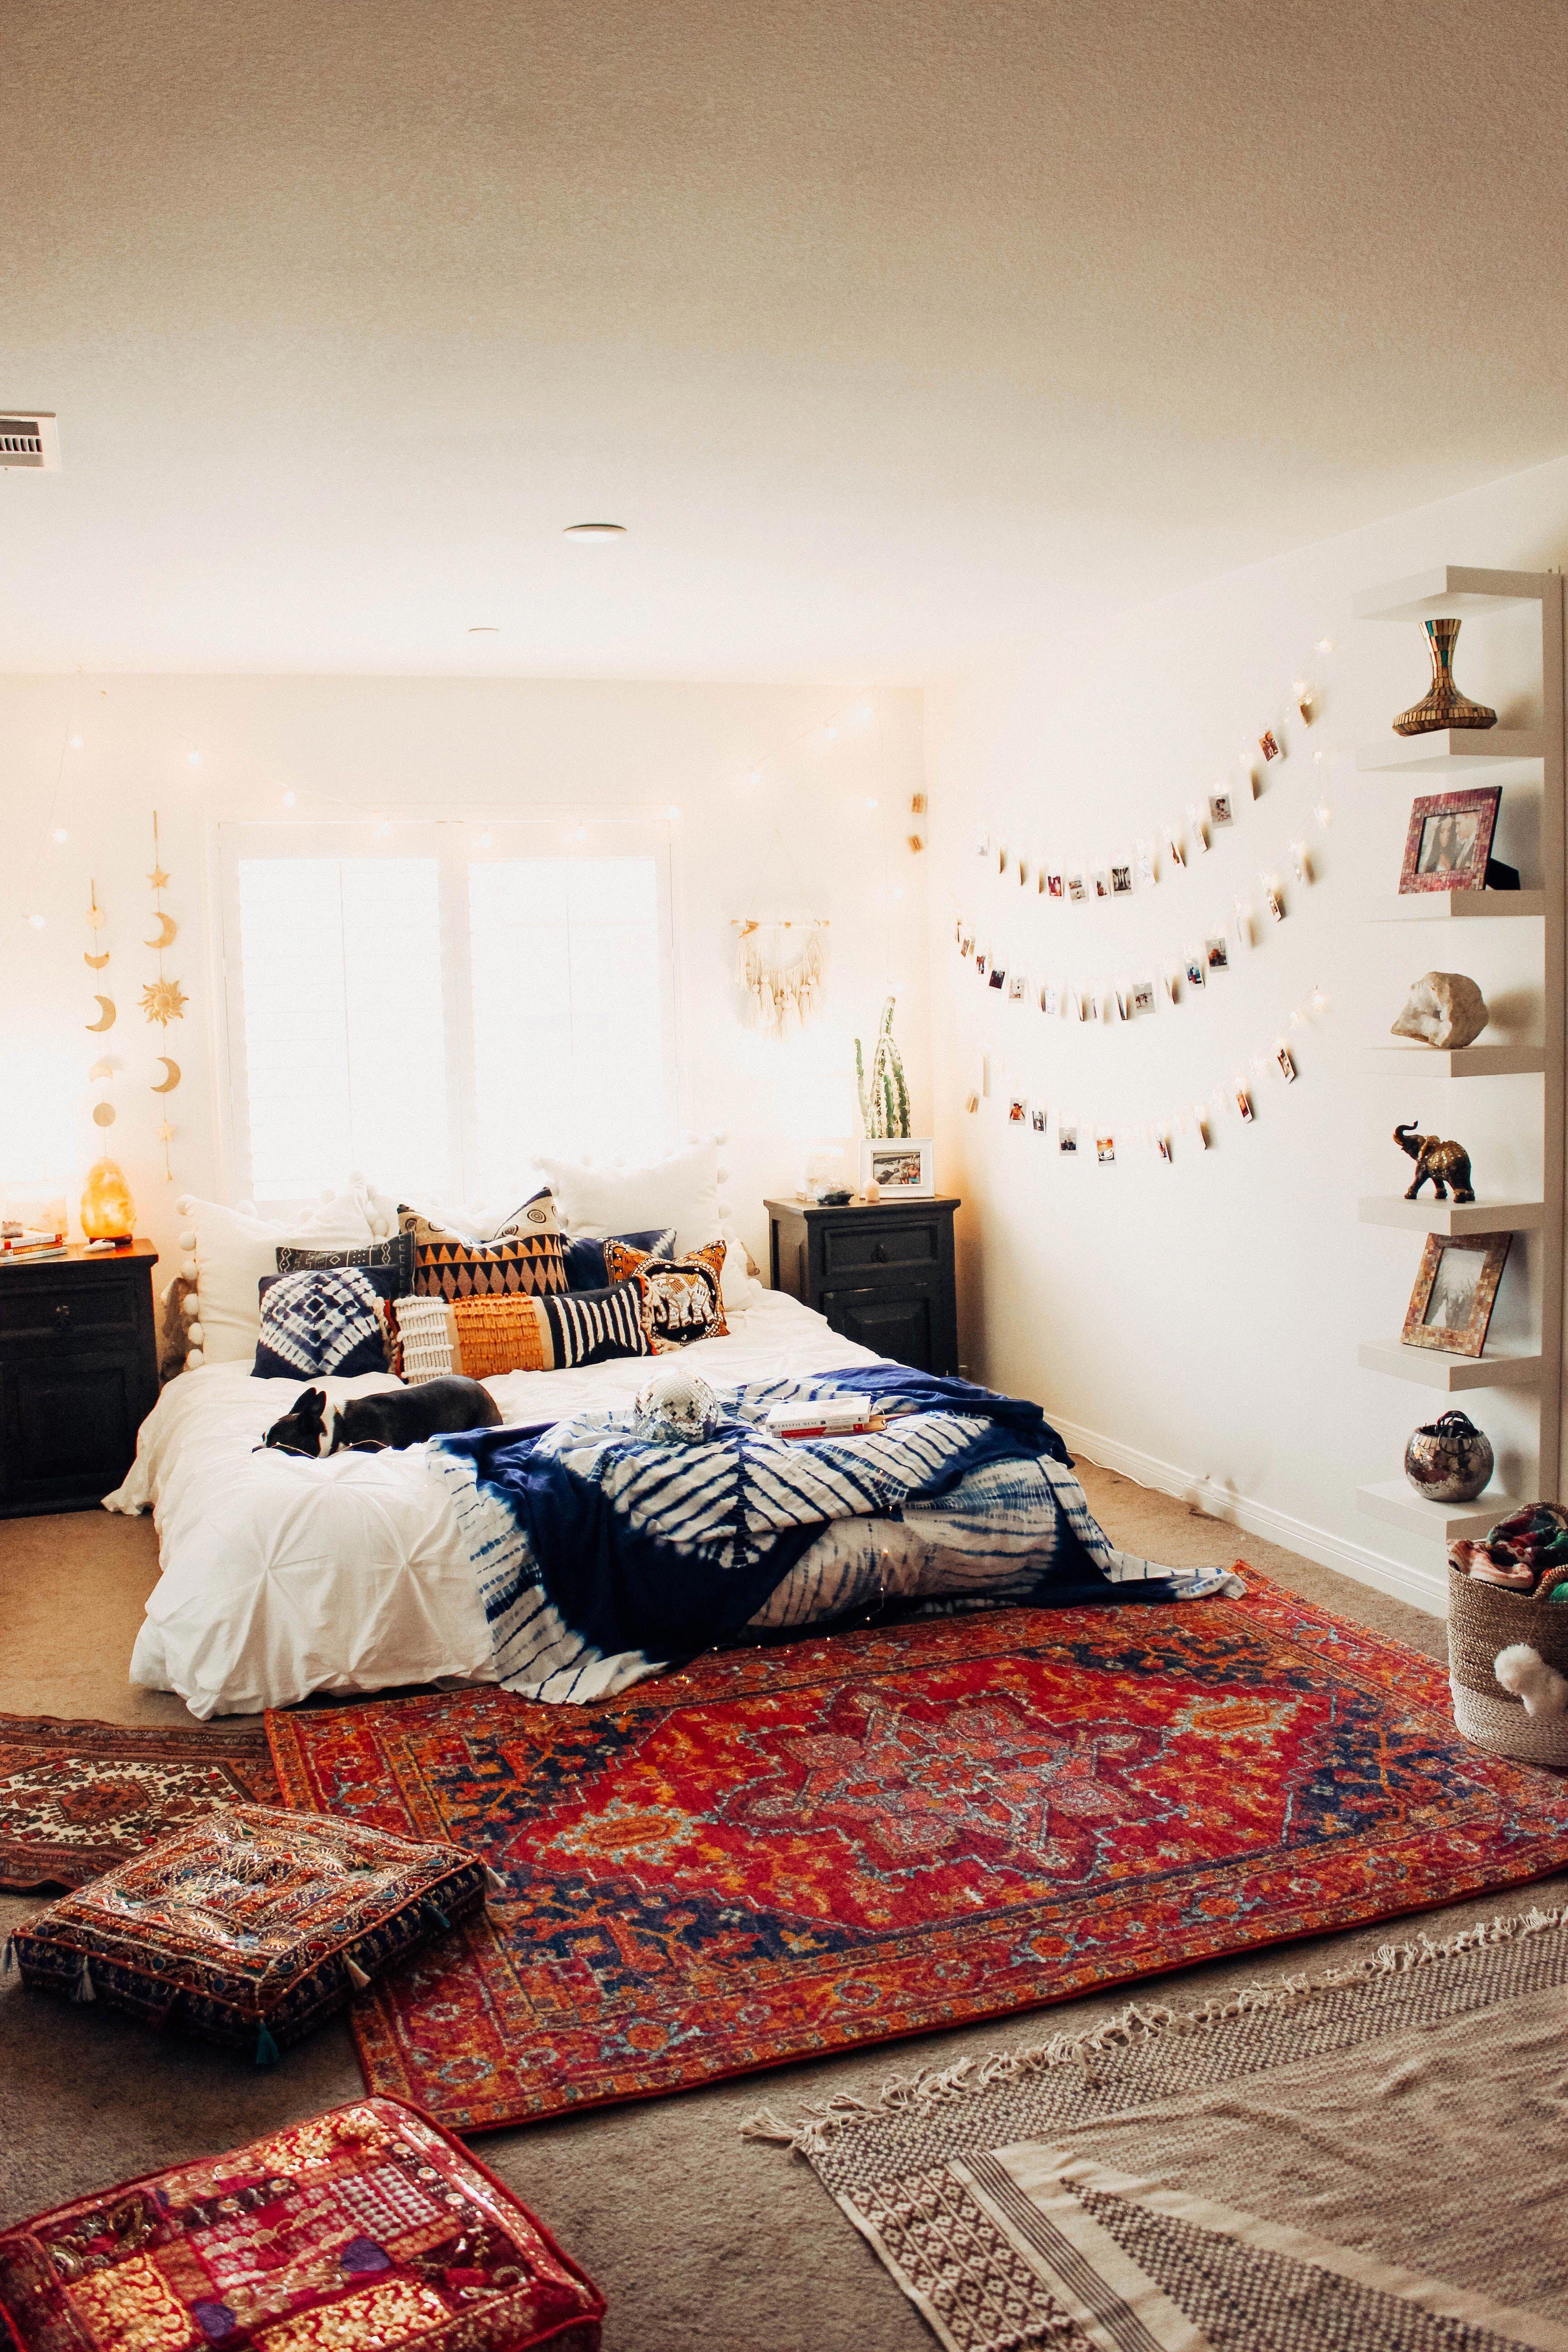 Decorative Items For Bedroom Help Me Decorate My Bedroom Look